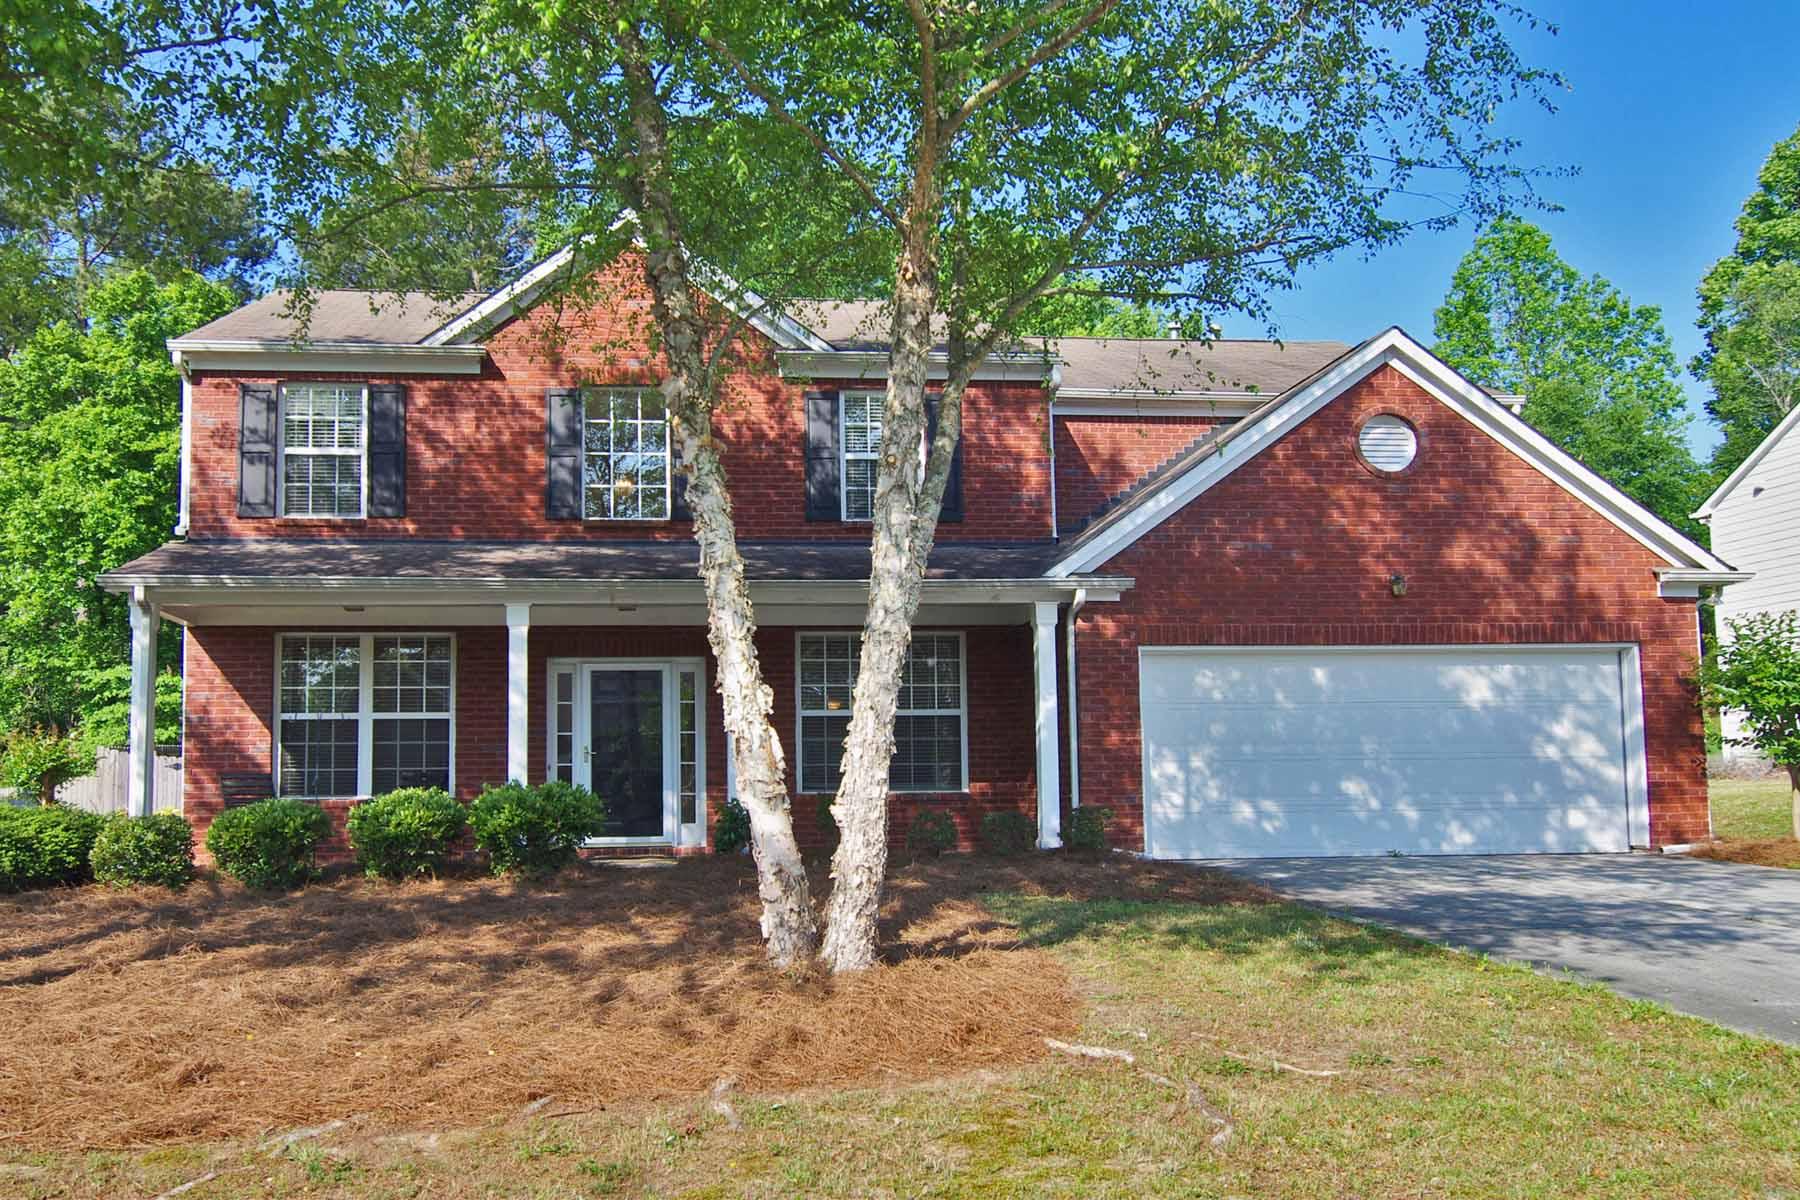 独户住宅 为 销售 在 Incredible house in Grayson School District. 2805 Haynes Club Circle 格雷森, 乔治亚州, 30017 美国